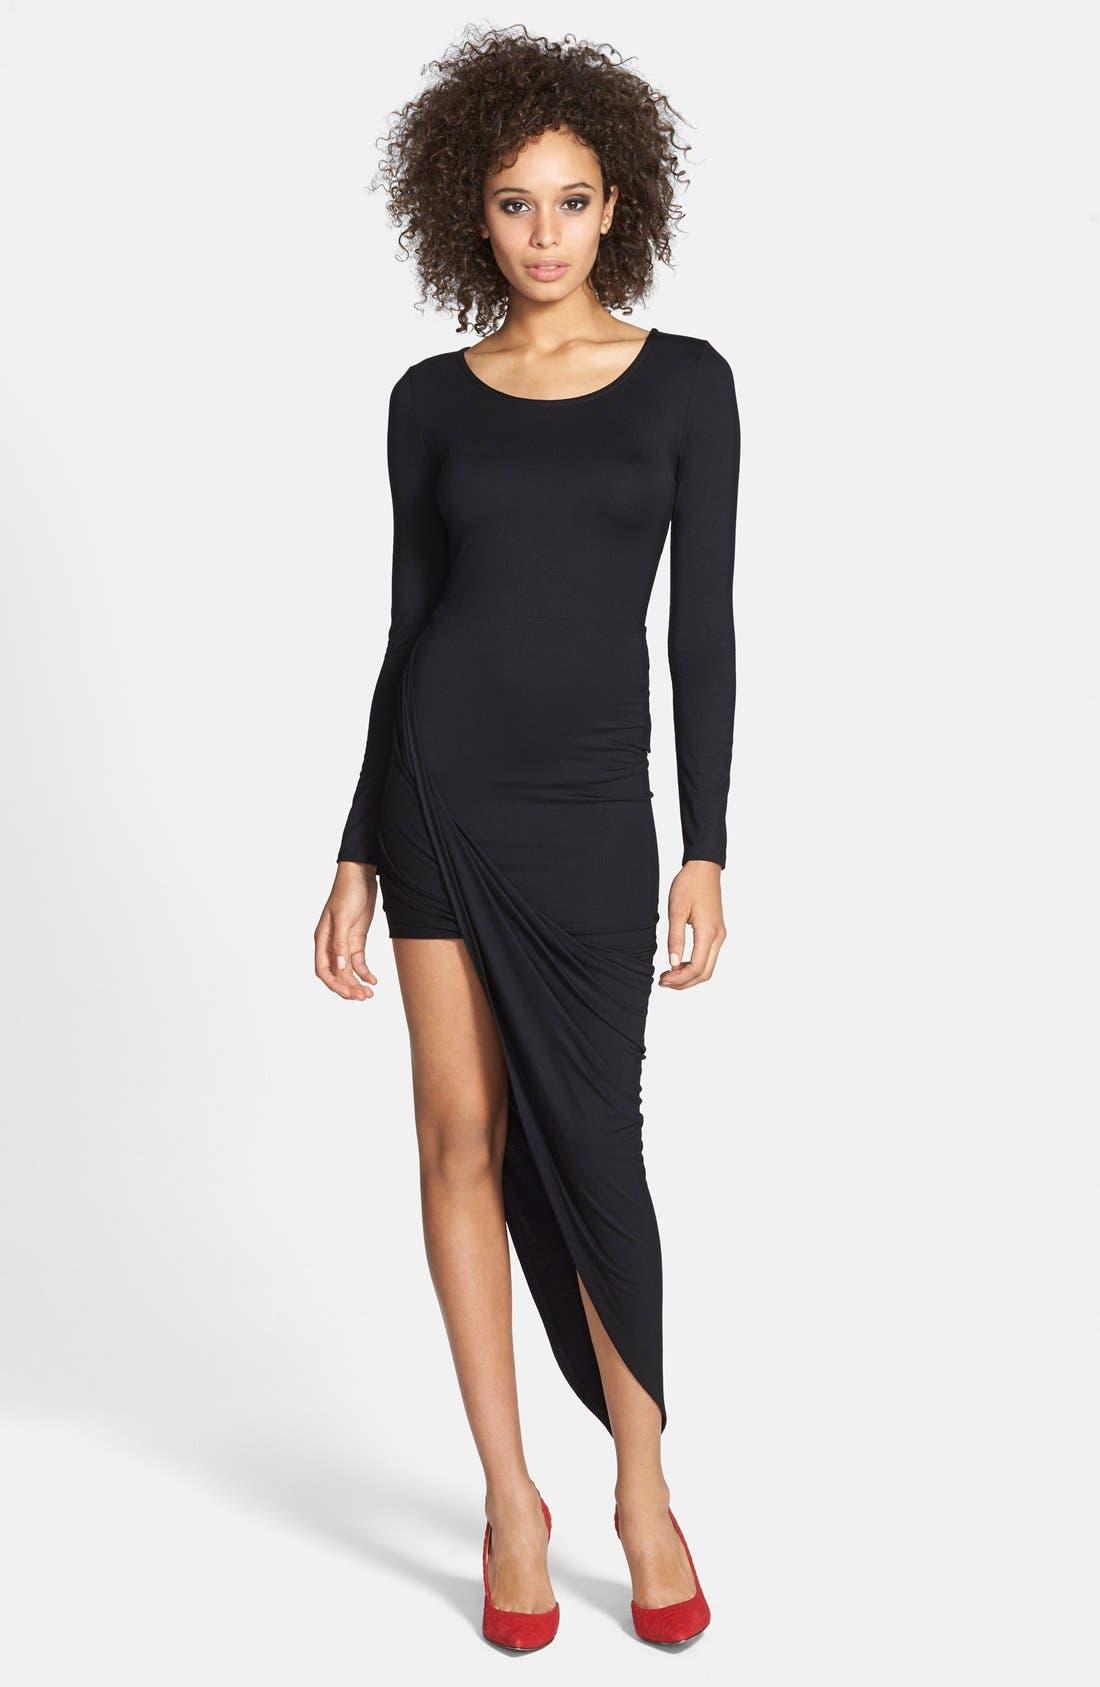 Alternate Image 1 Selected - ASTR Twist Wrap Asymmetrical Body-Con Dress